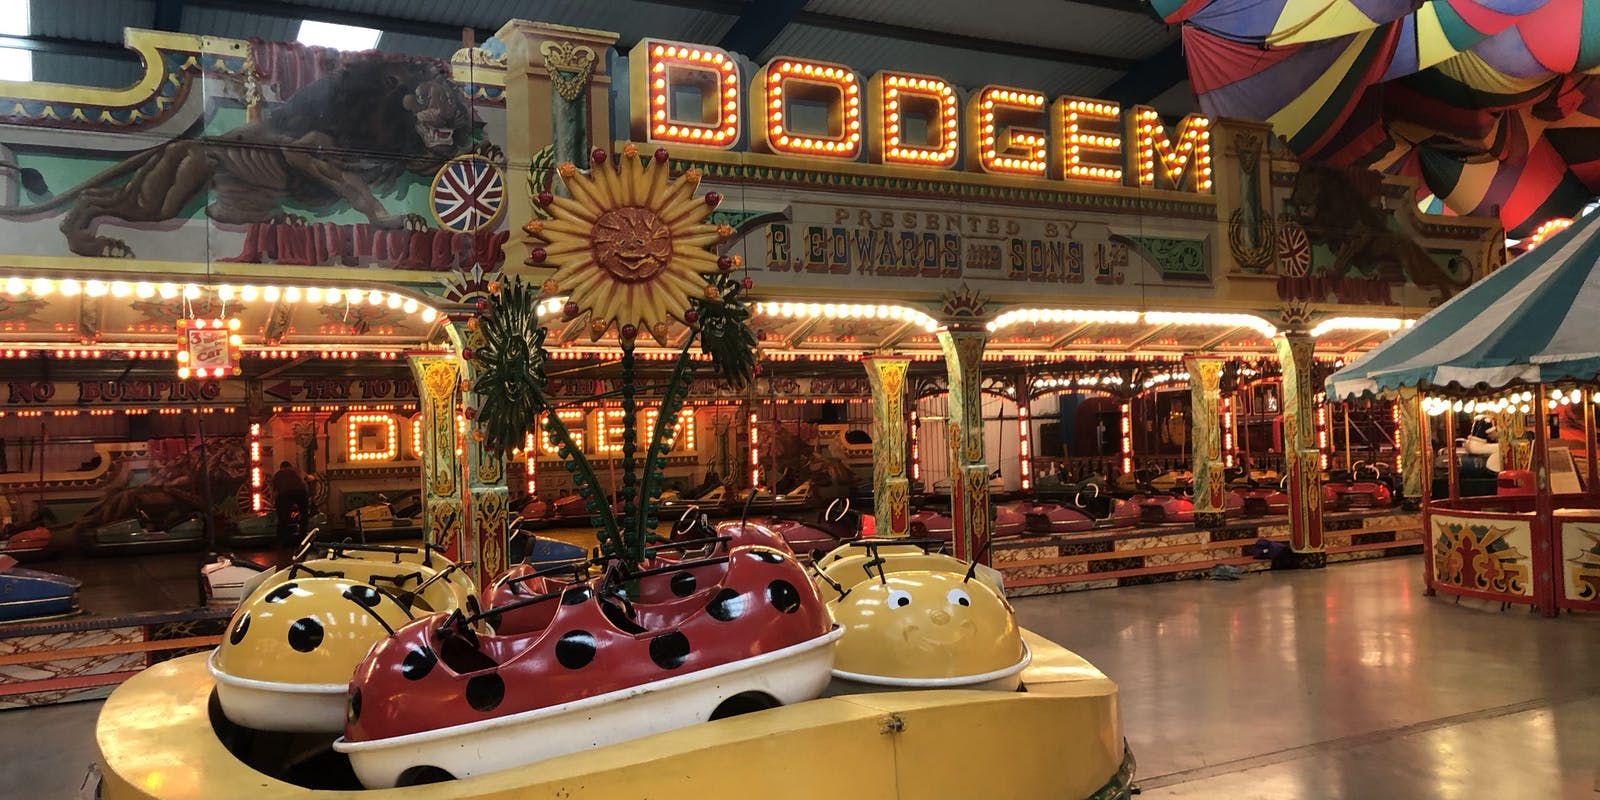 Dodgems at Dingles